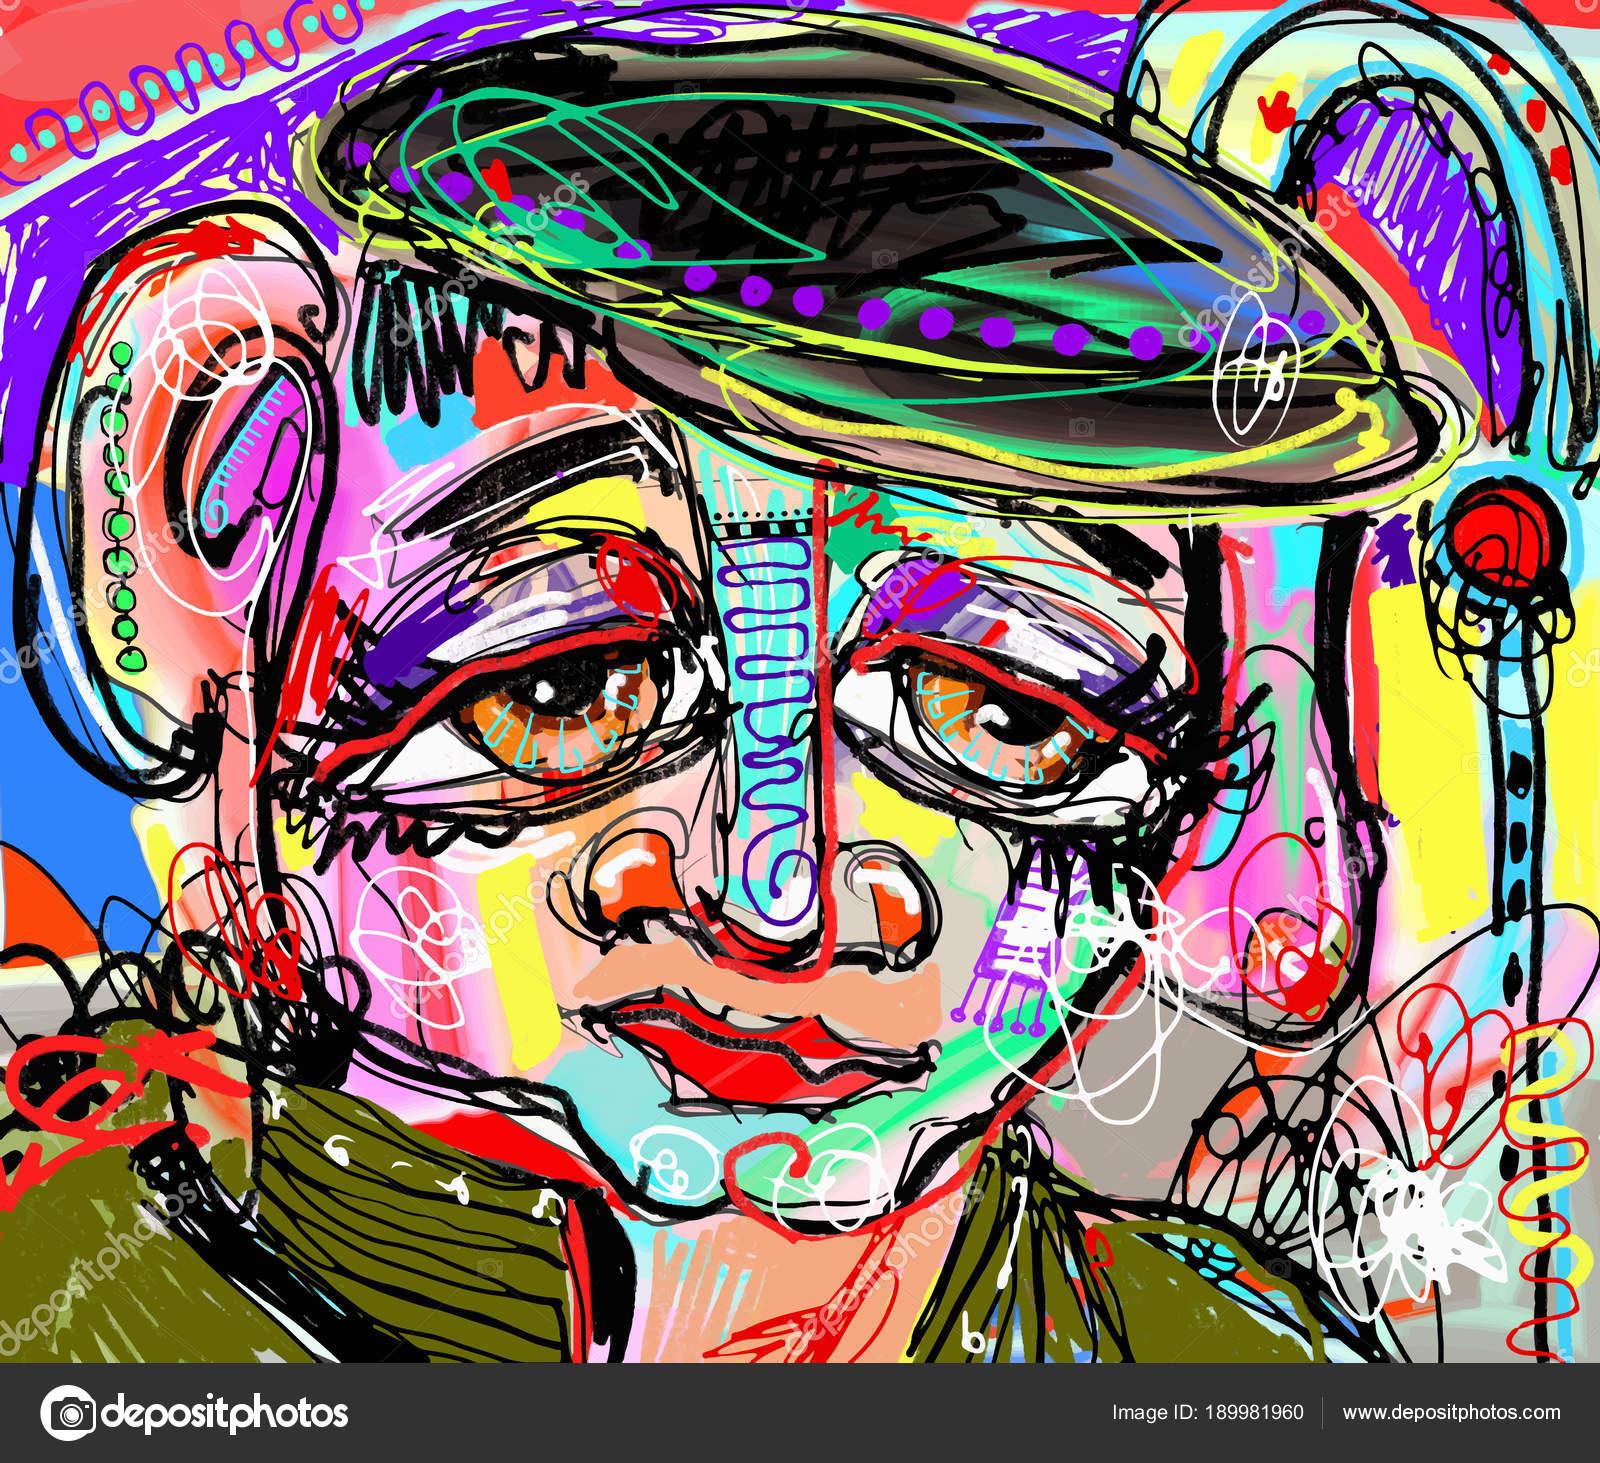 Printable Face Painting Designs For Cheeks Original Abstract Digital Painting Of Human Face Stock Vector C Karakotsya 189981960